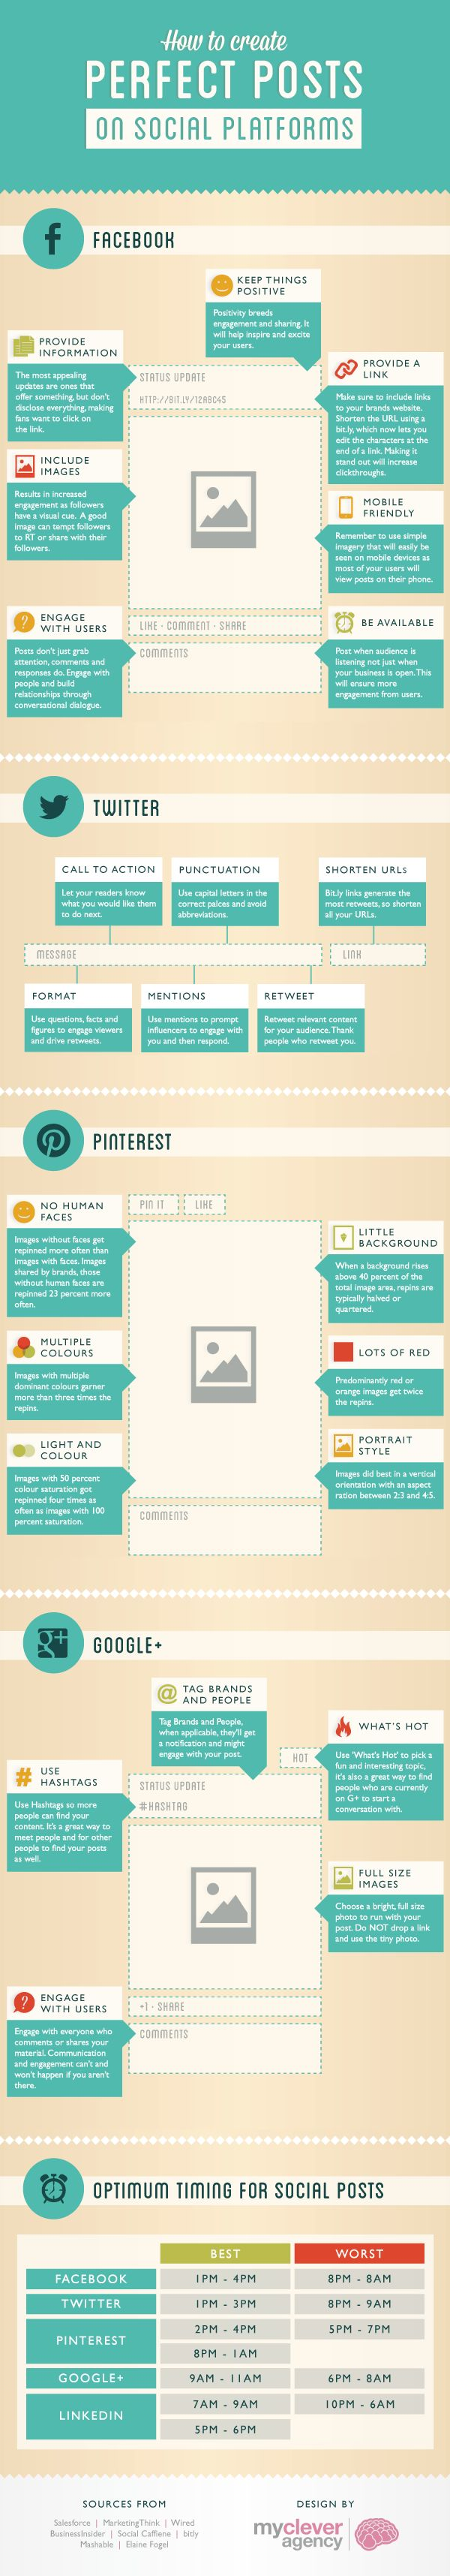 social media tips infographic